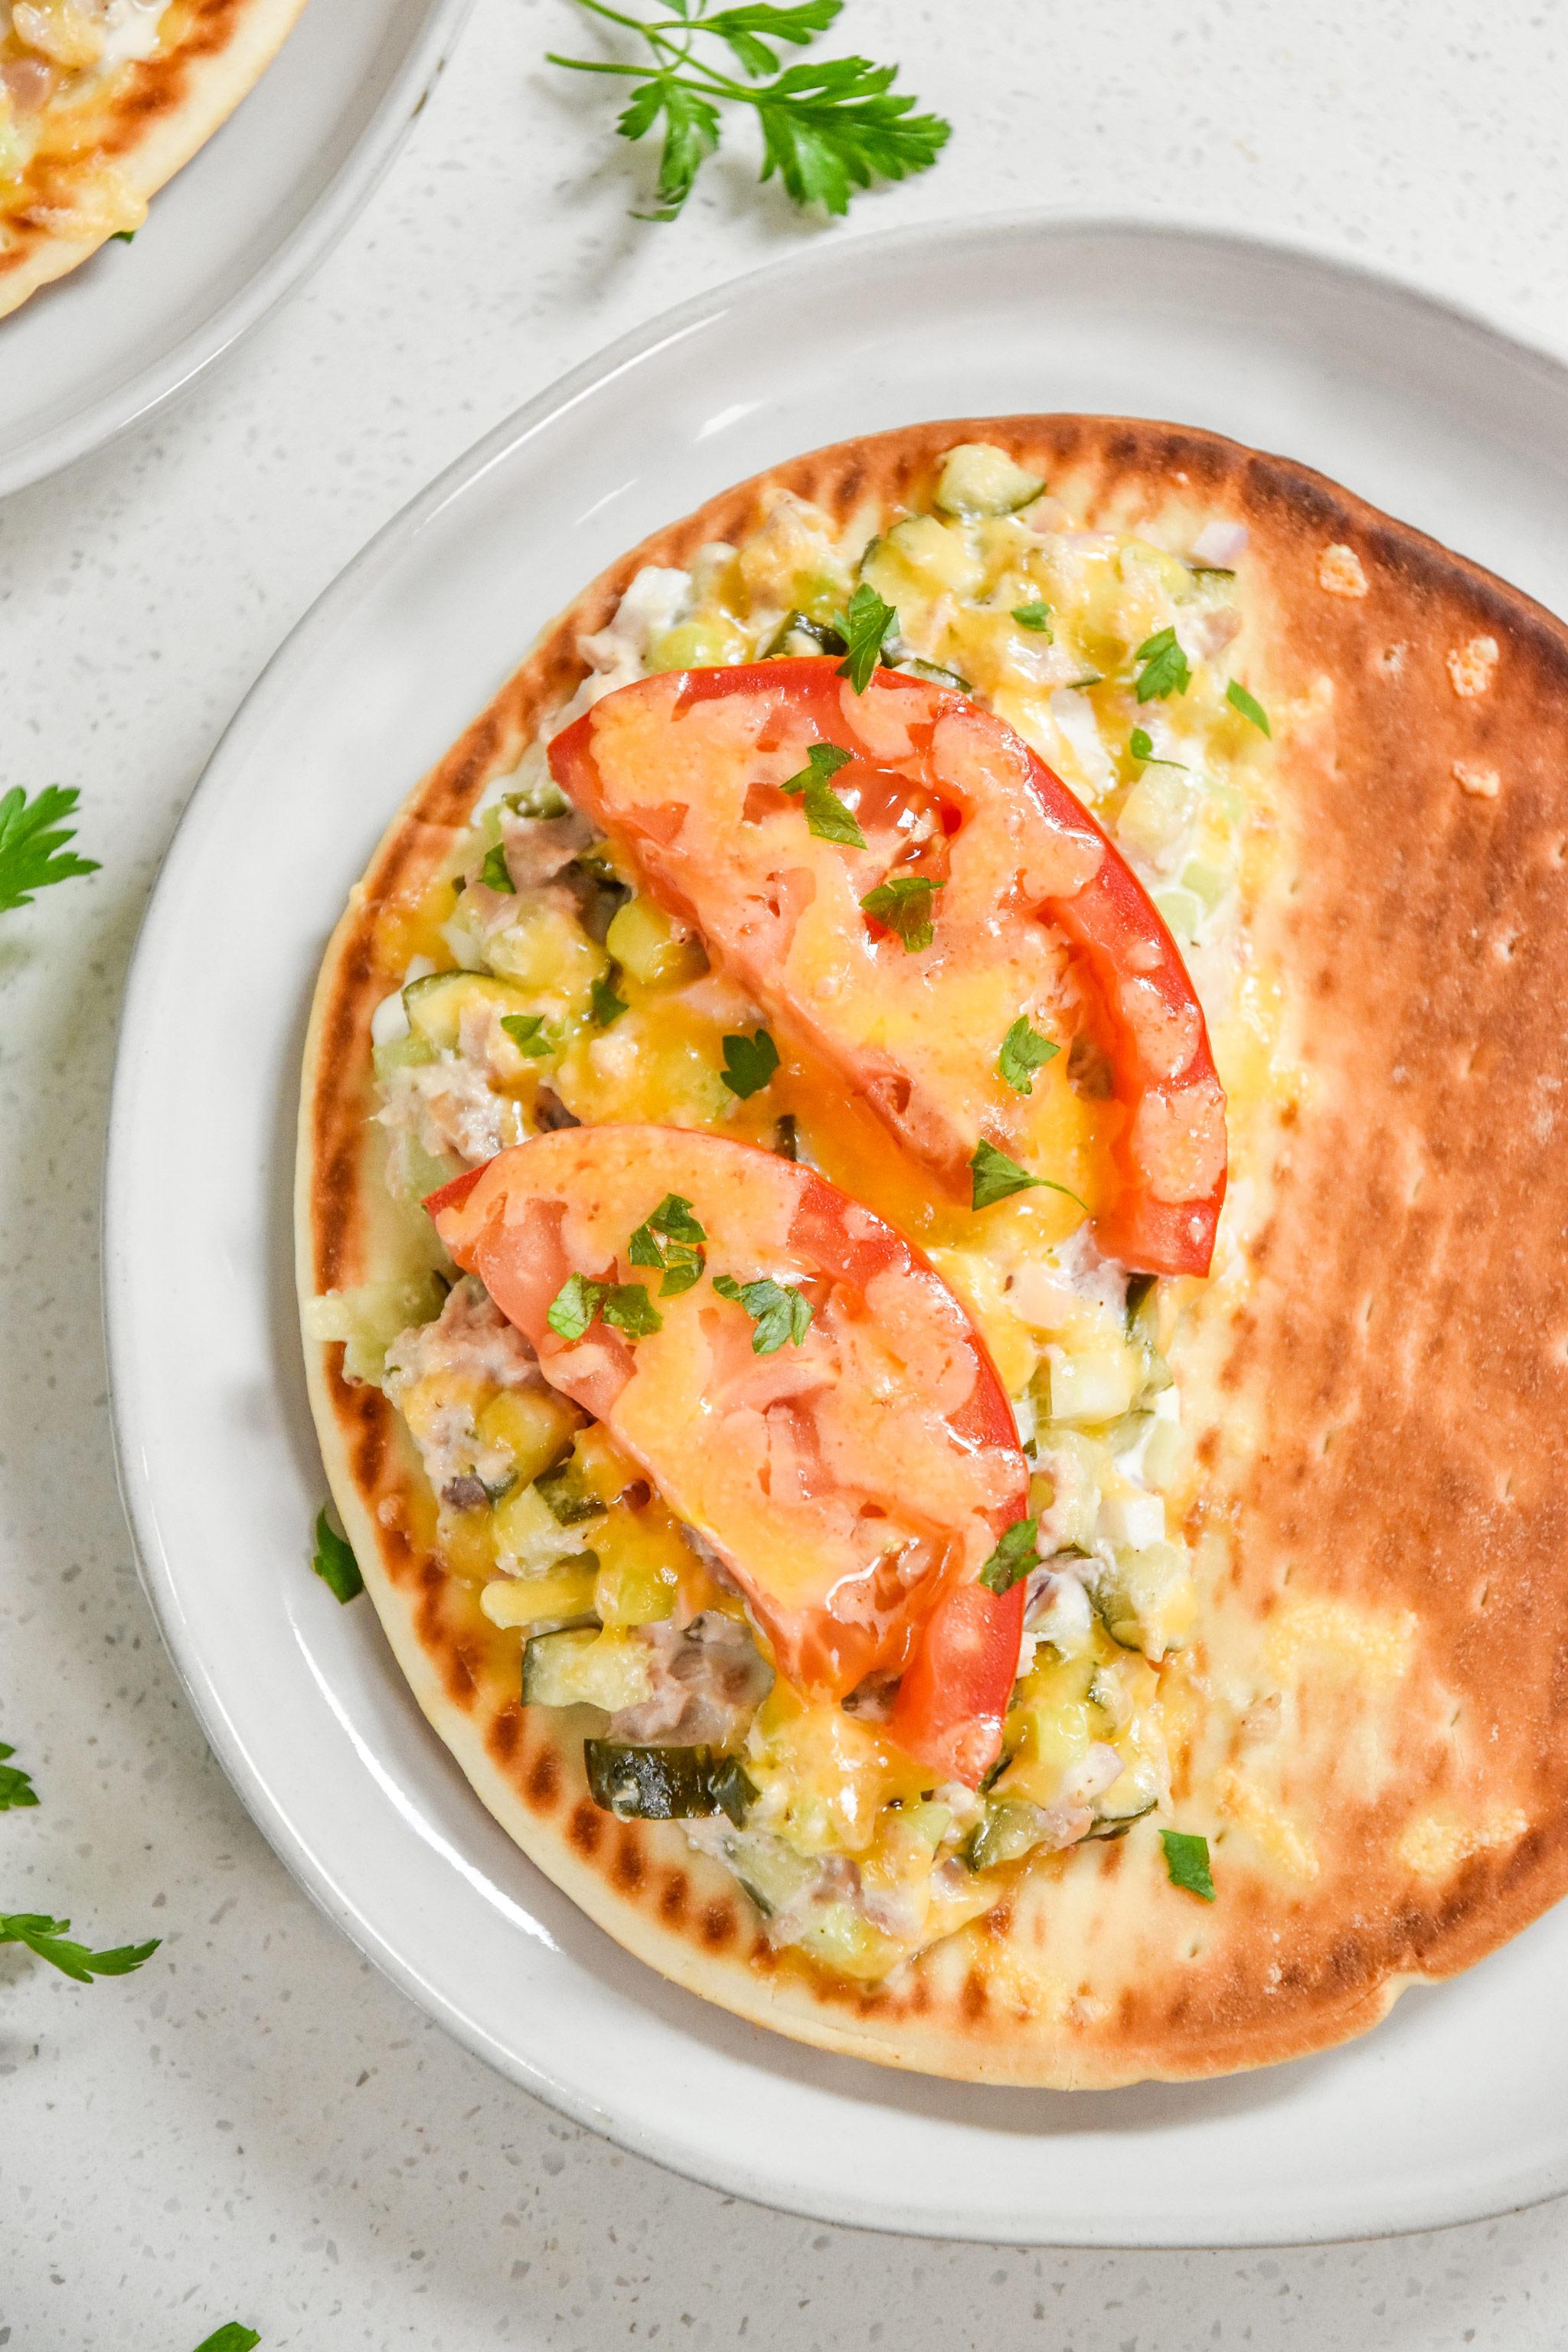 tuna melt pita sandwiches fresh from the oven